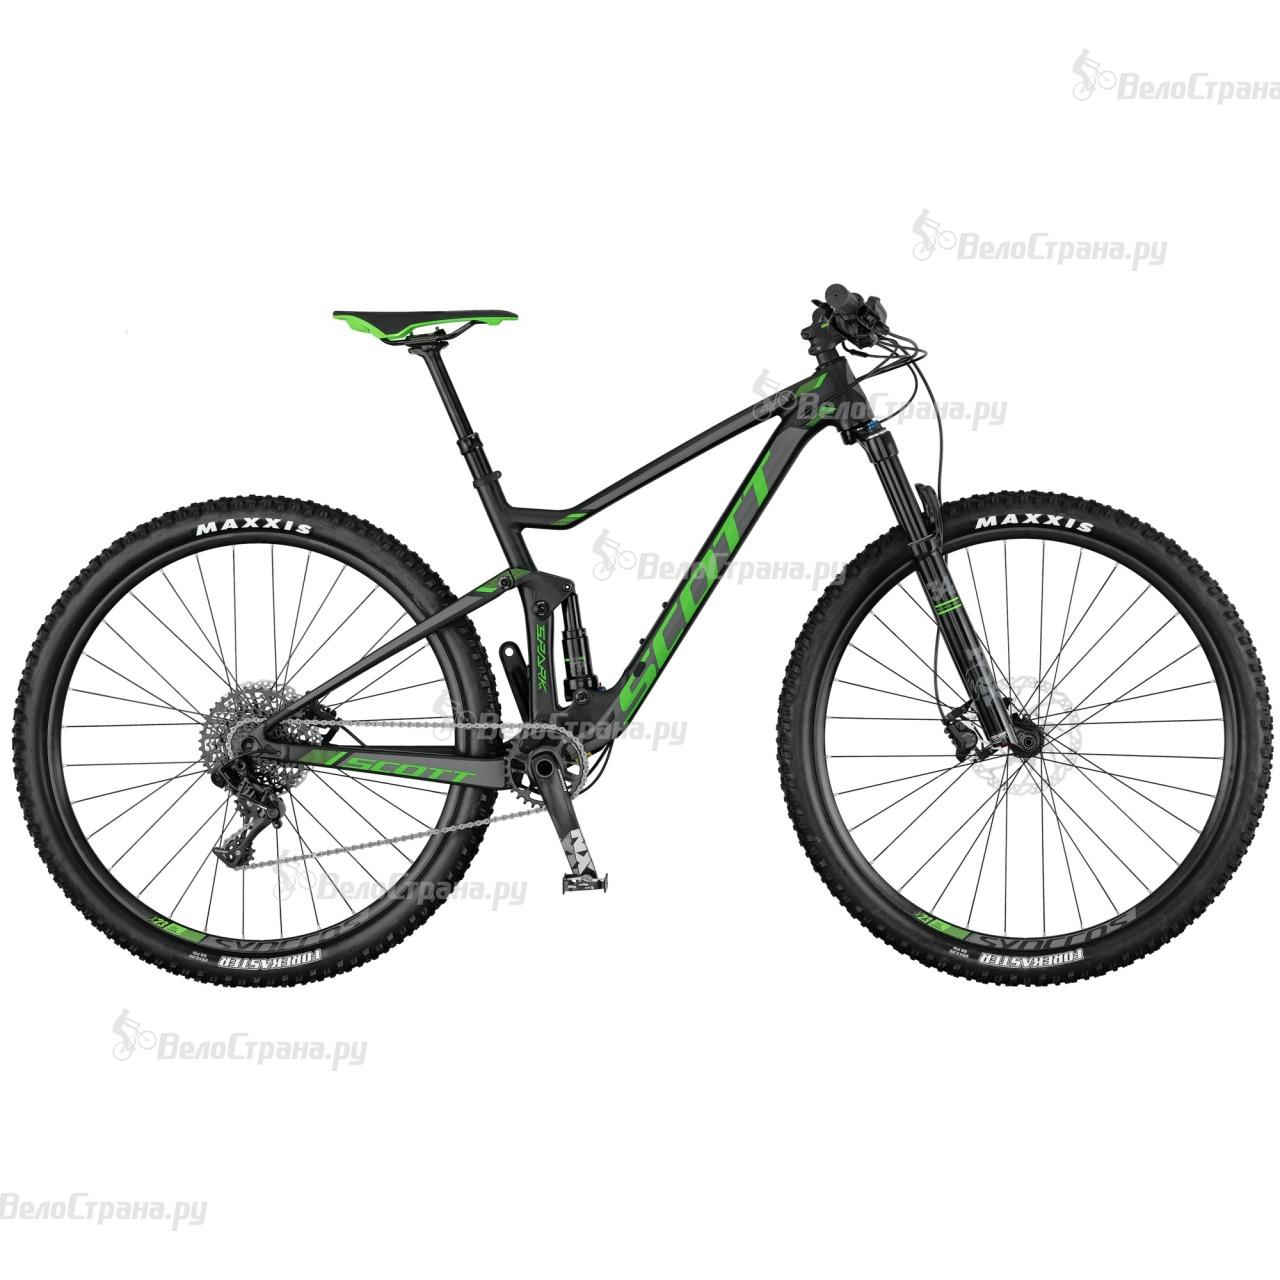 Велосипед Scott Spark 945 (2017)